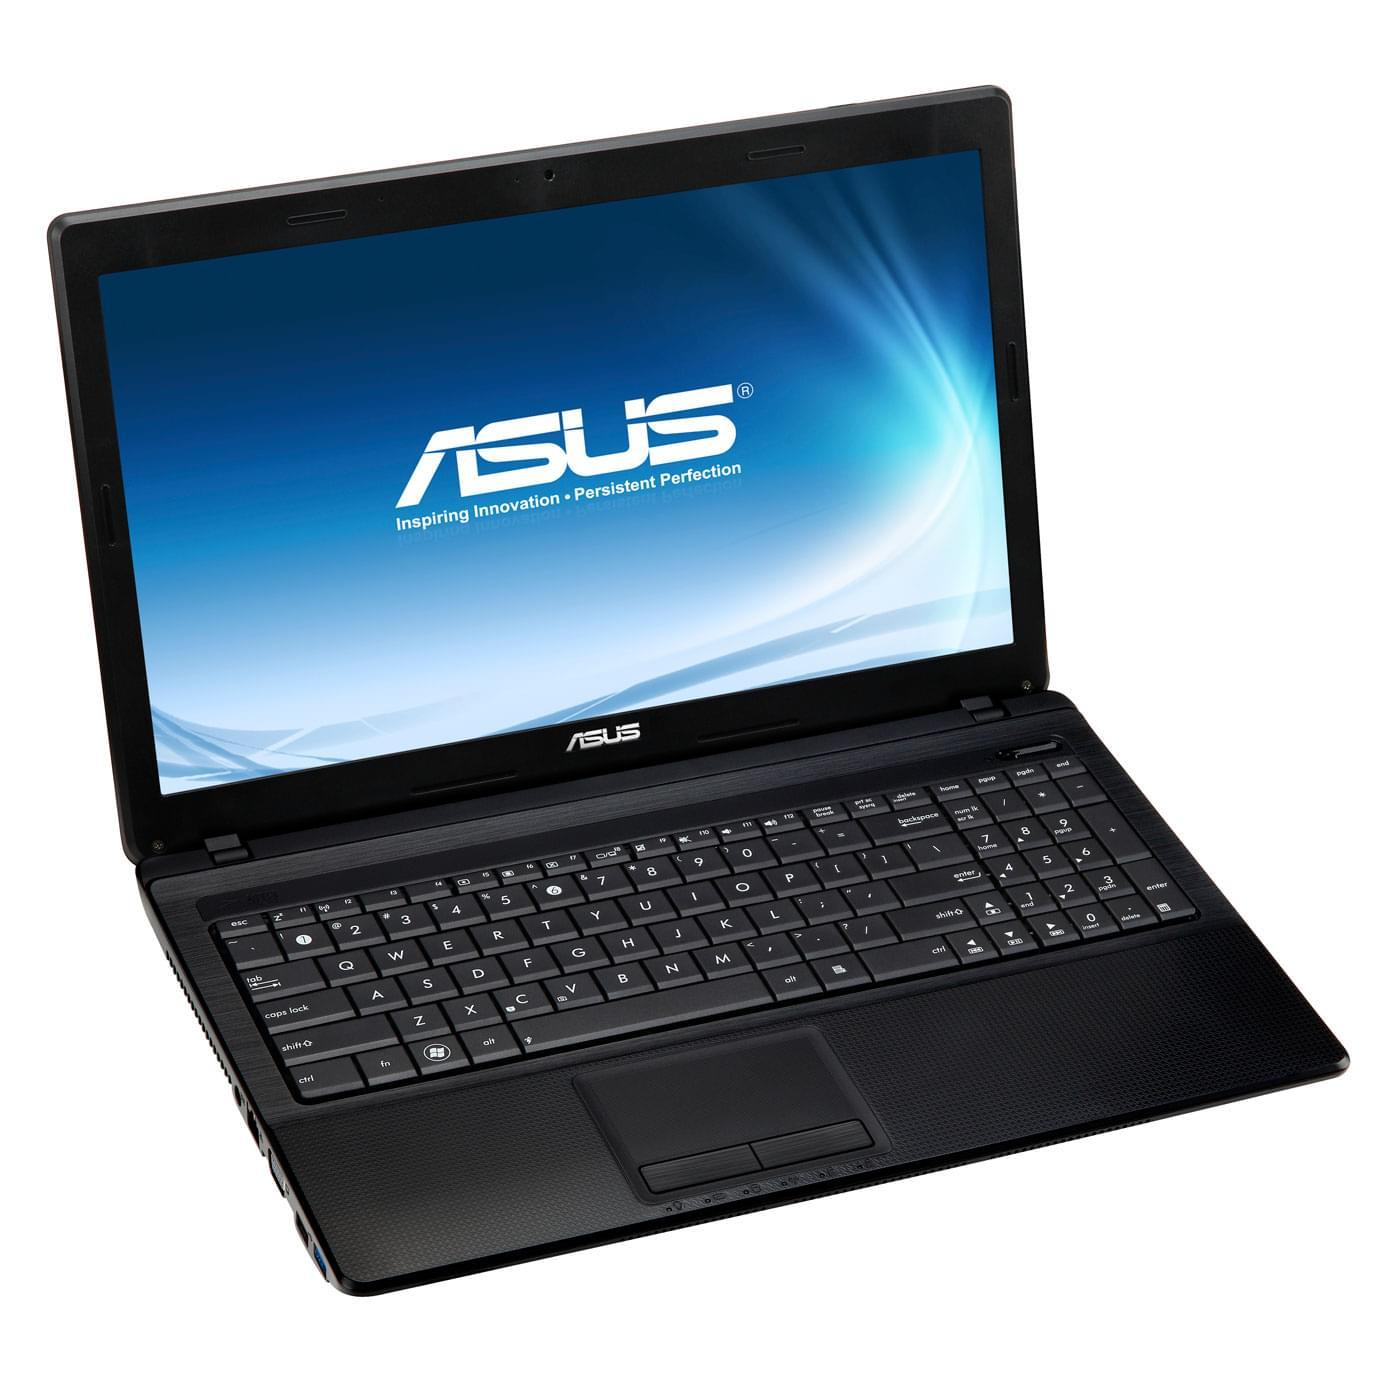 Asus X54C-SX025V - PC portable Asus - Cybertek.fr - 0